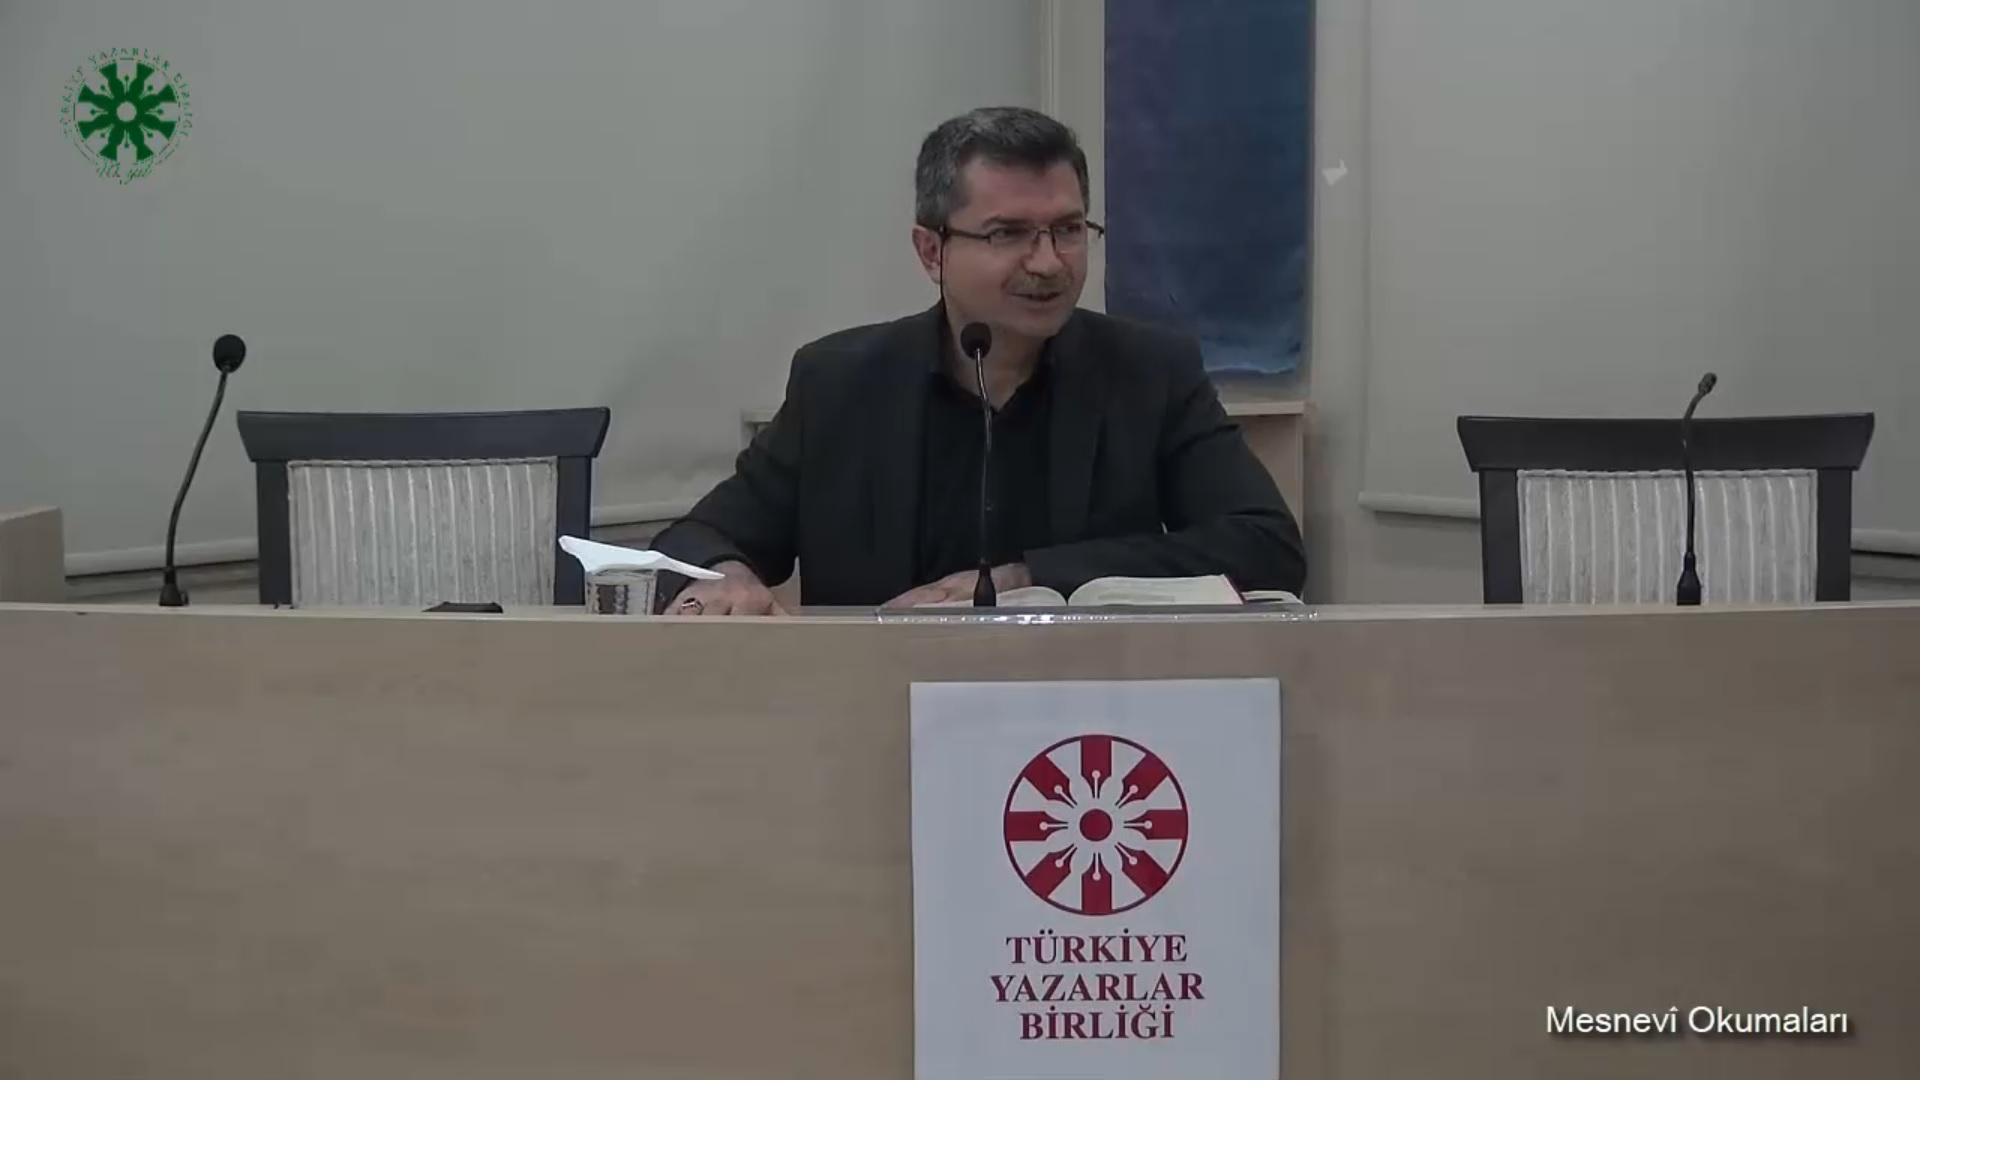 Mesnevî Okumaları - 14 - Dr. Fahrettin Coşguner (video)